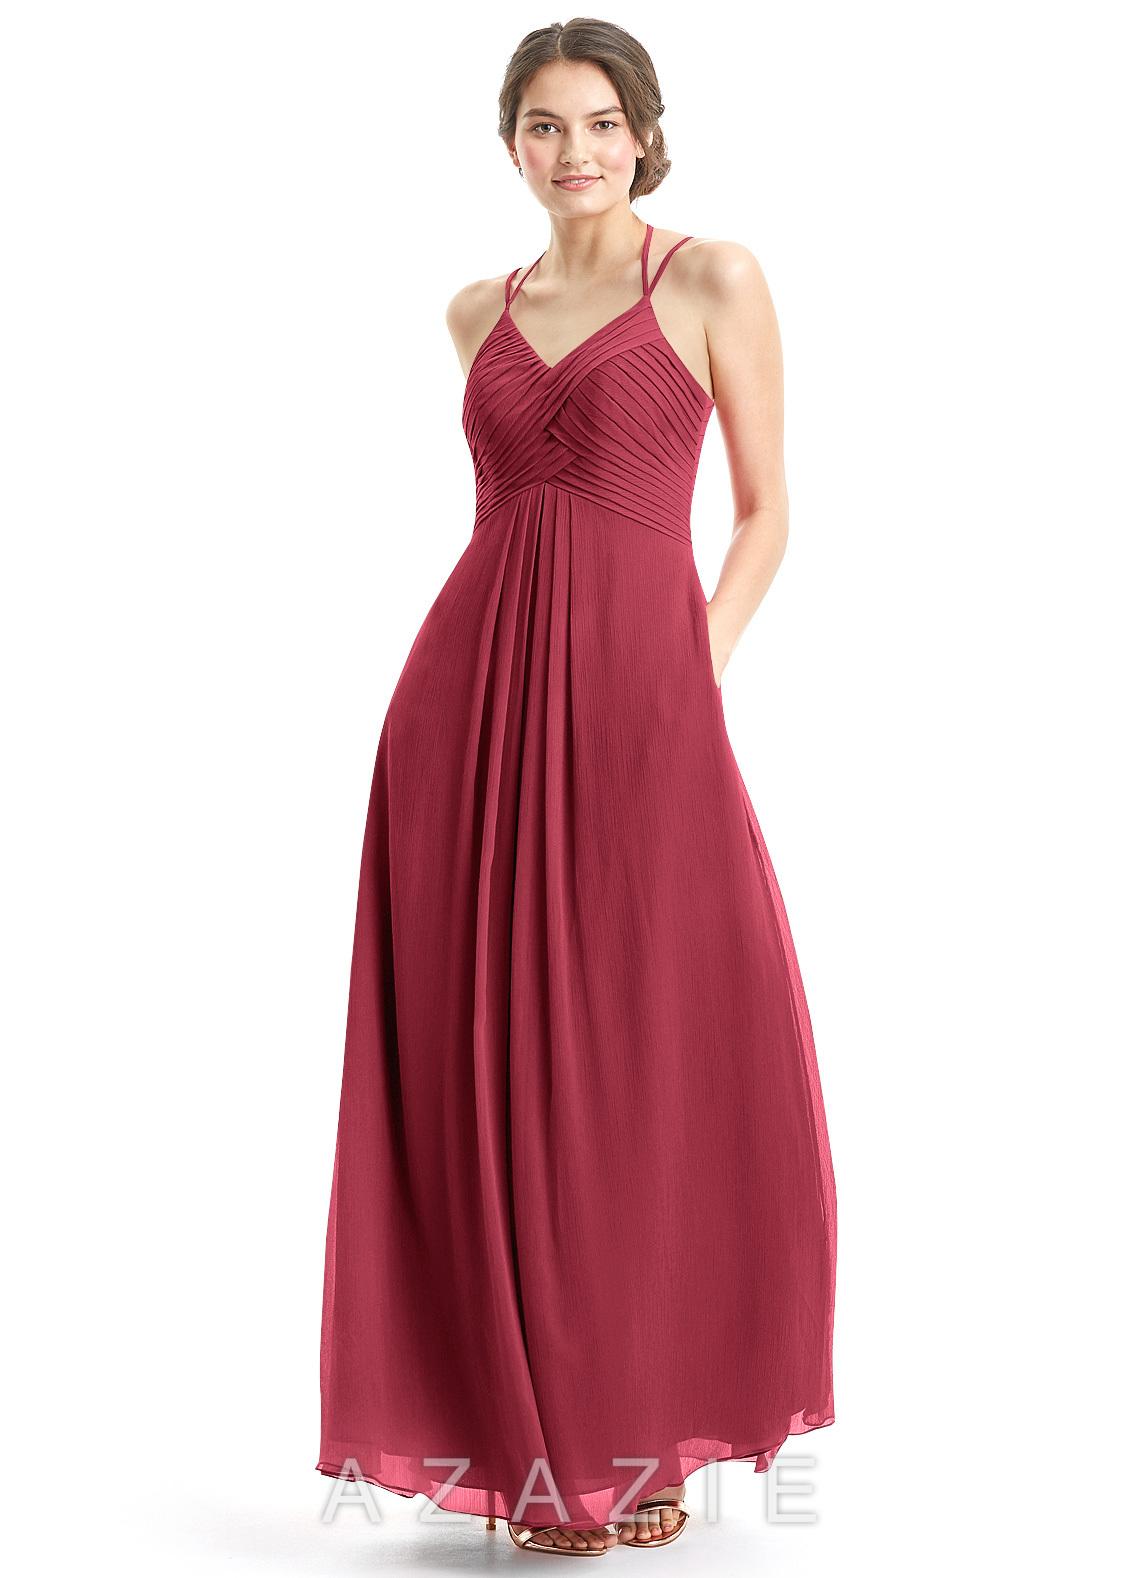 Azazie eden bridesmaid dress azazie home bridesmaid dresses azazie eden azazie eden loading zoom ombrellifo Images